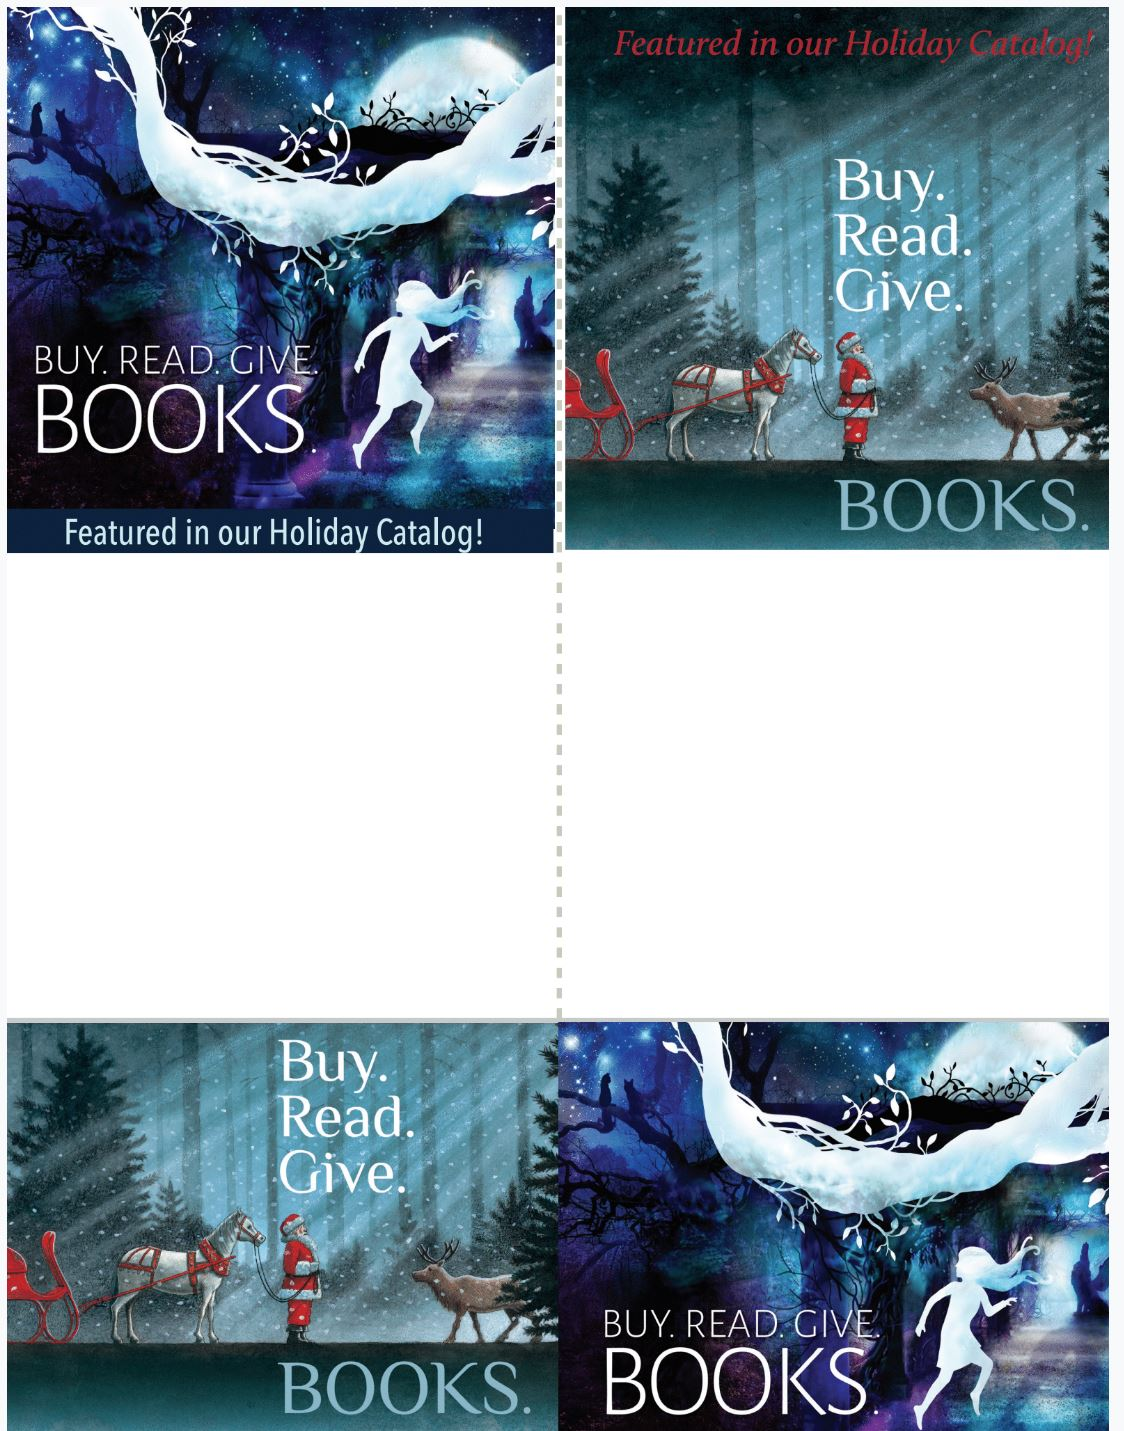 Holiday Catalog Slim Card